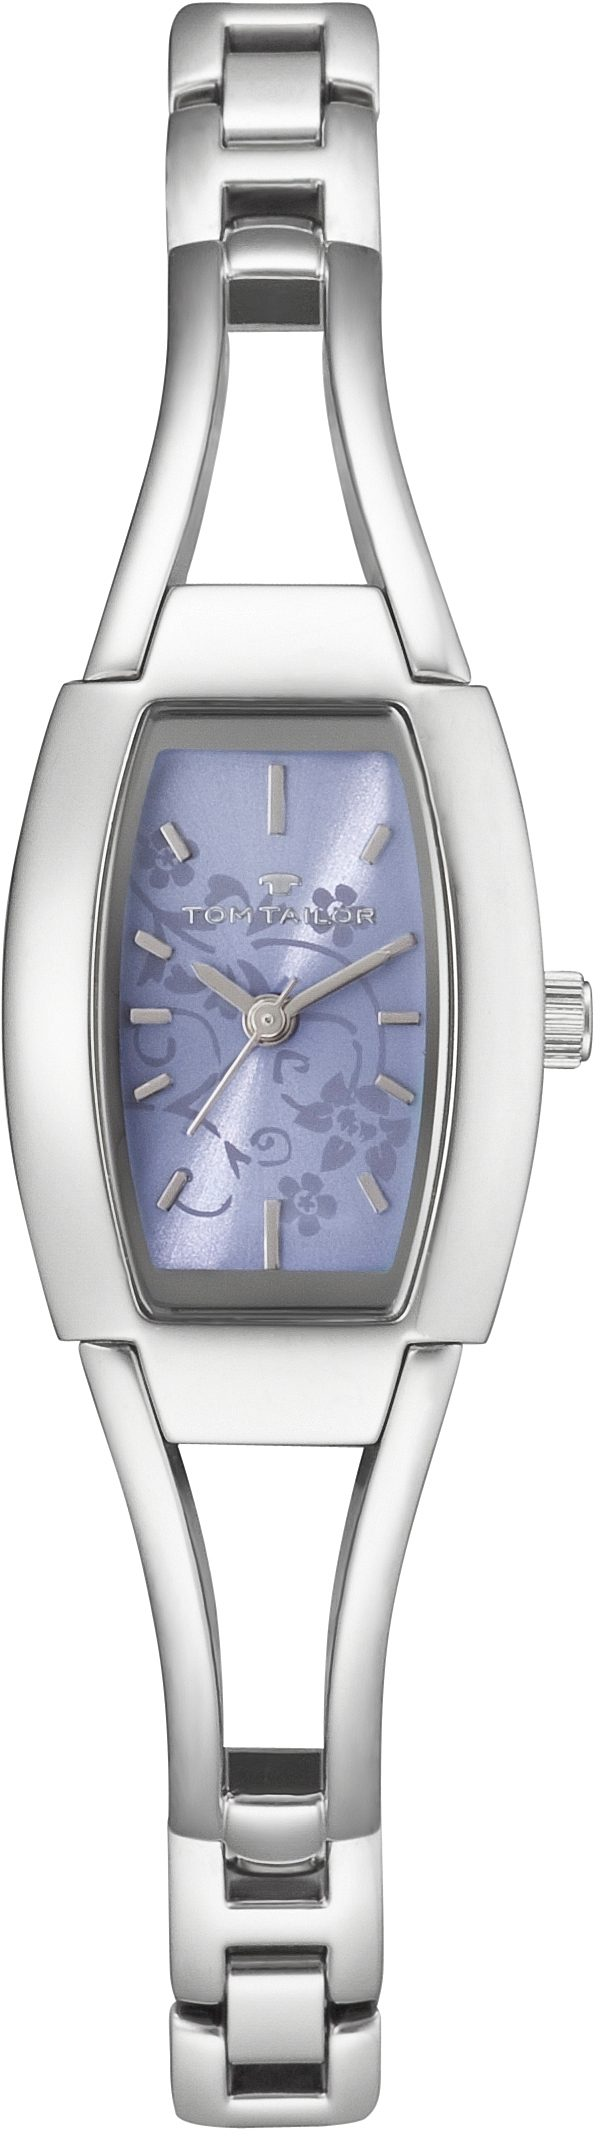 Tom Tailor Armbanduhr, »5401207«